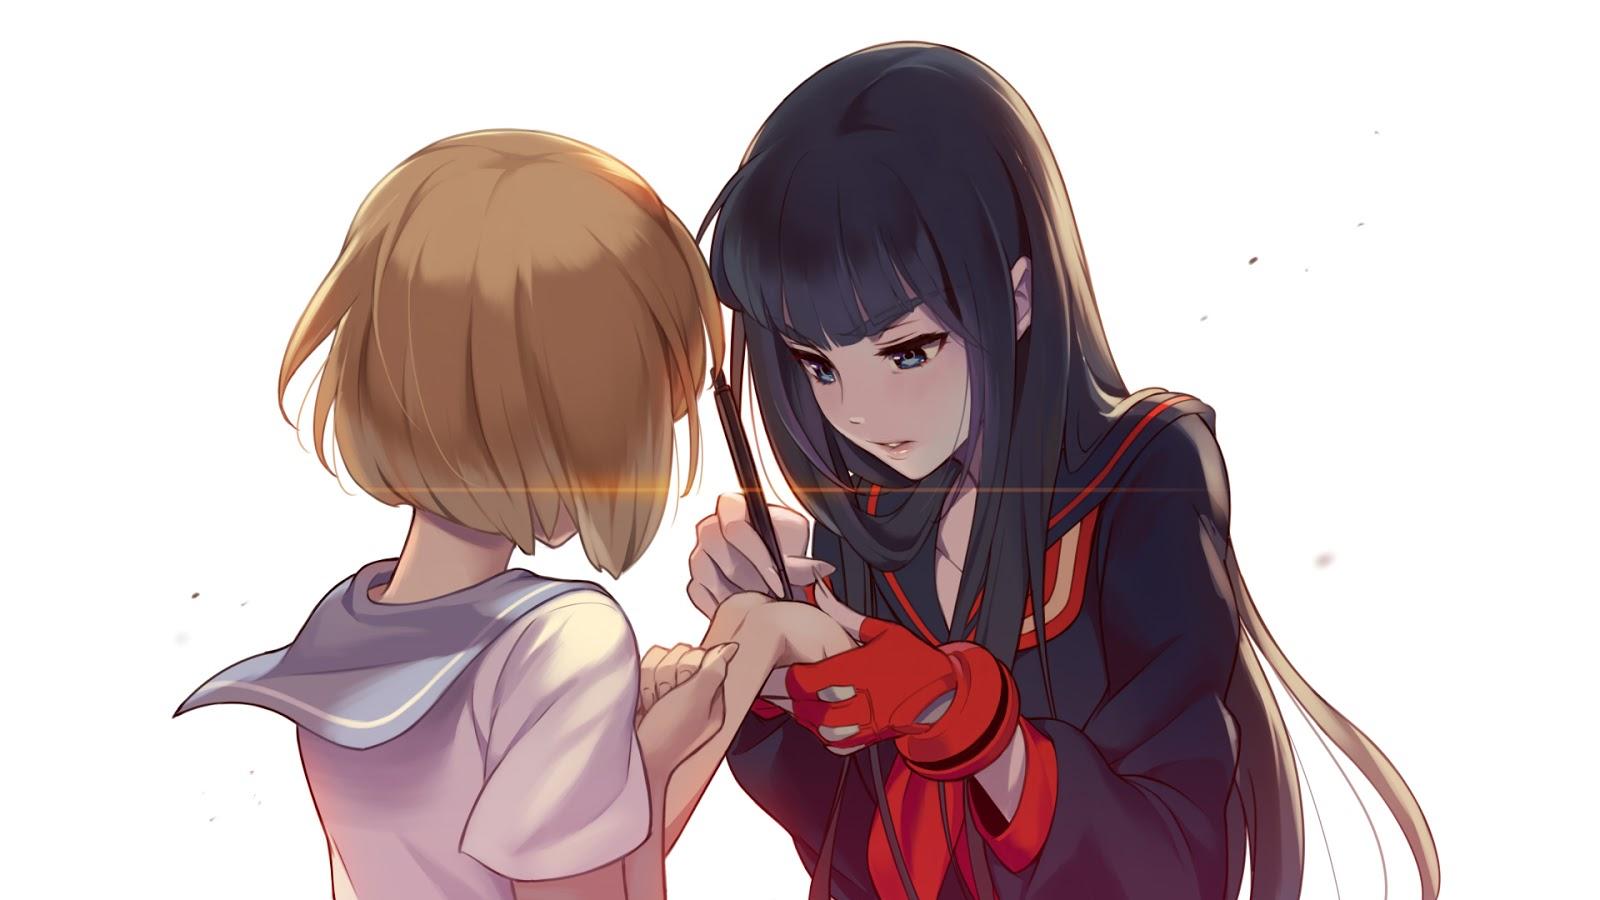 kill la kill kiryuin satsuki mankanshoku mako 1920x1080jpg 1600x900